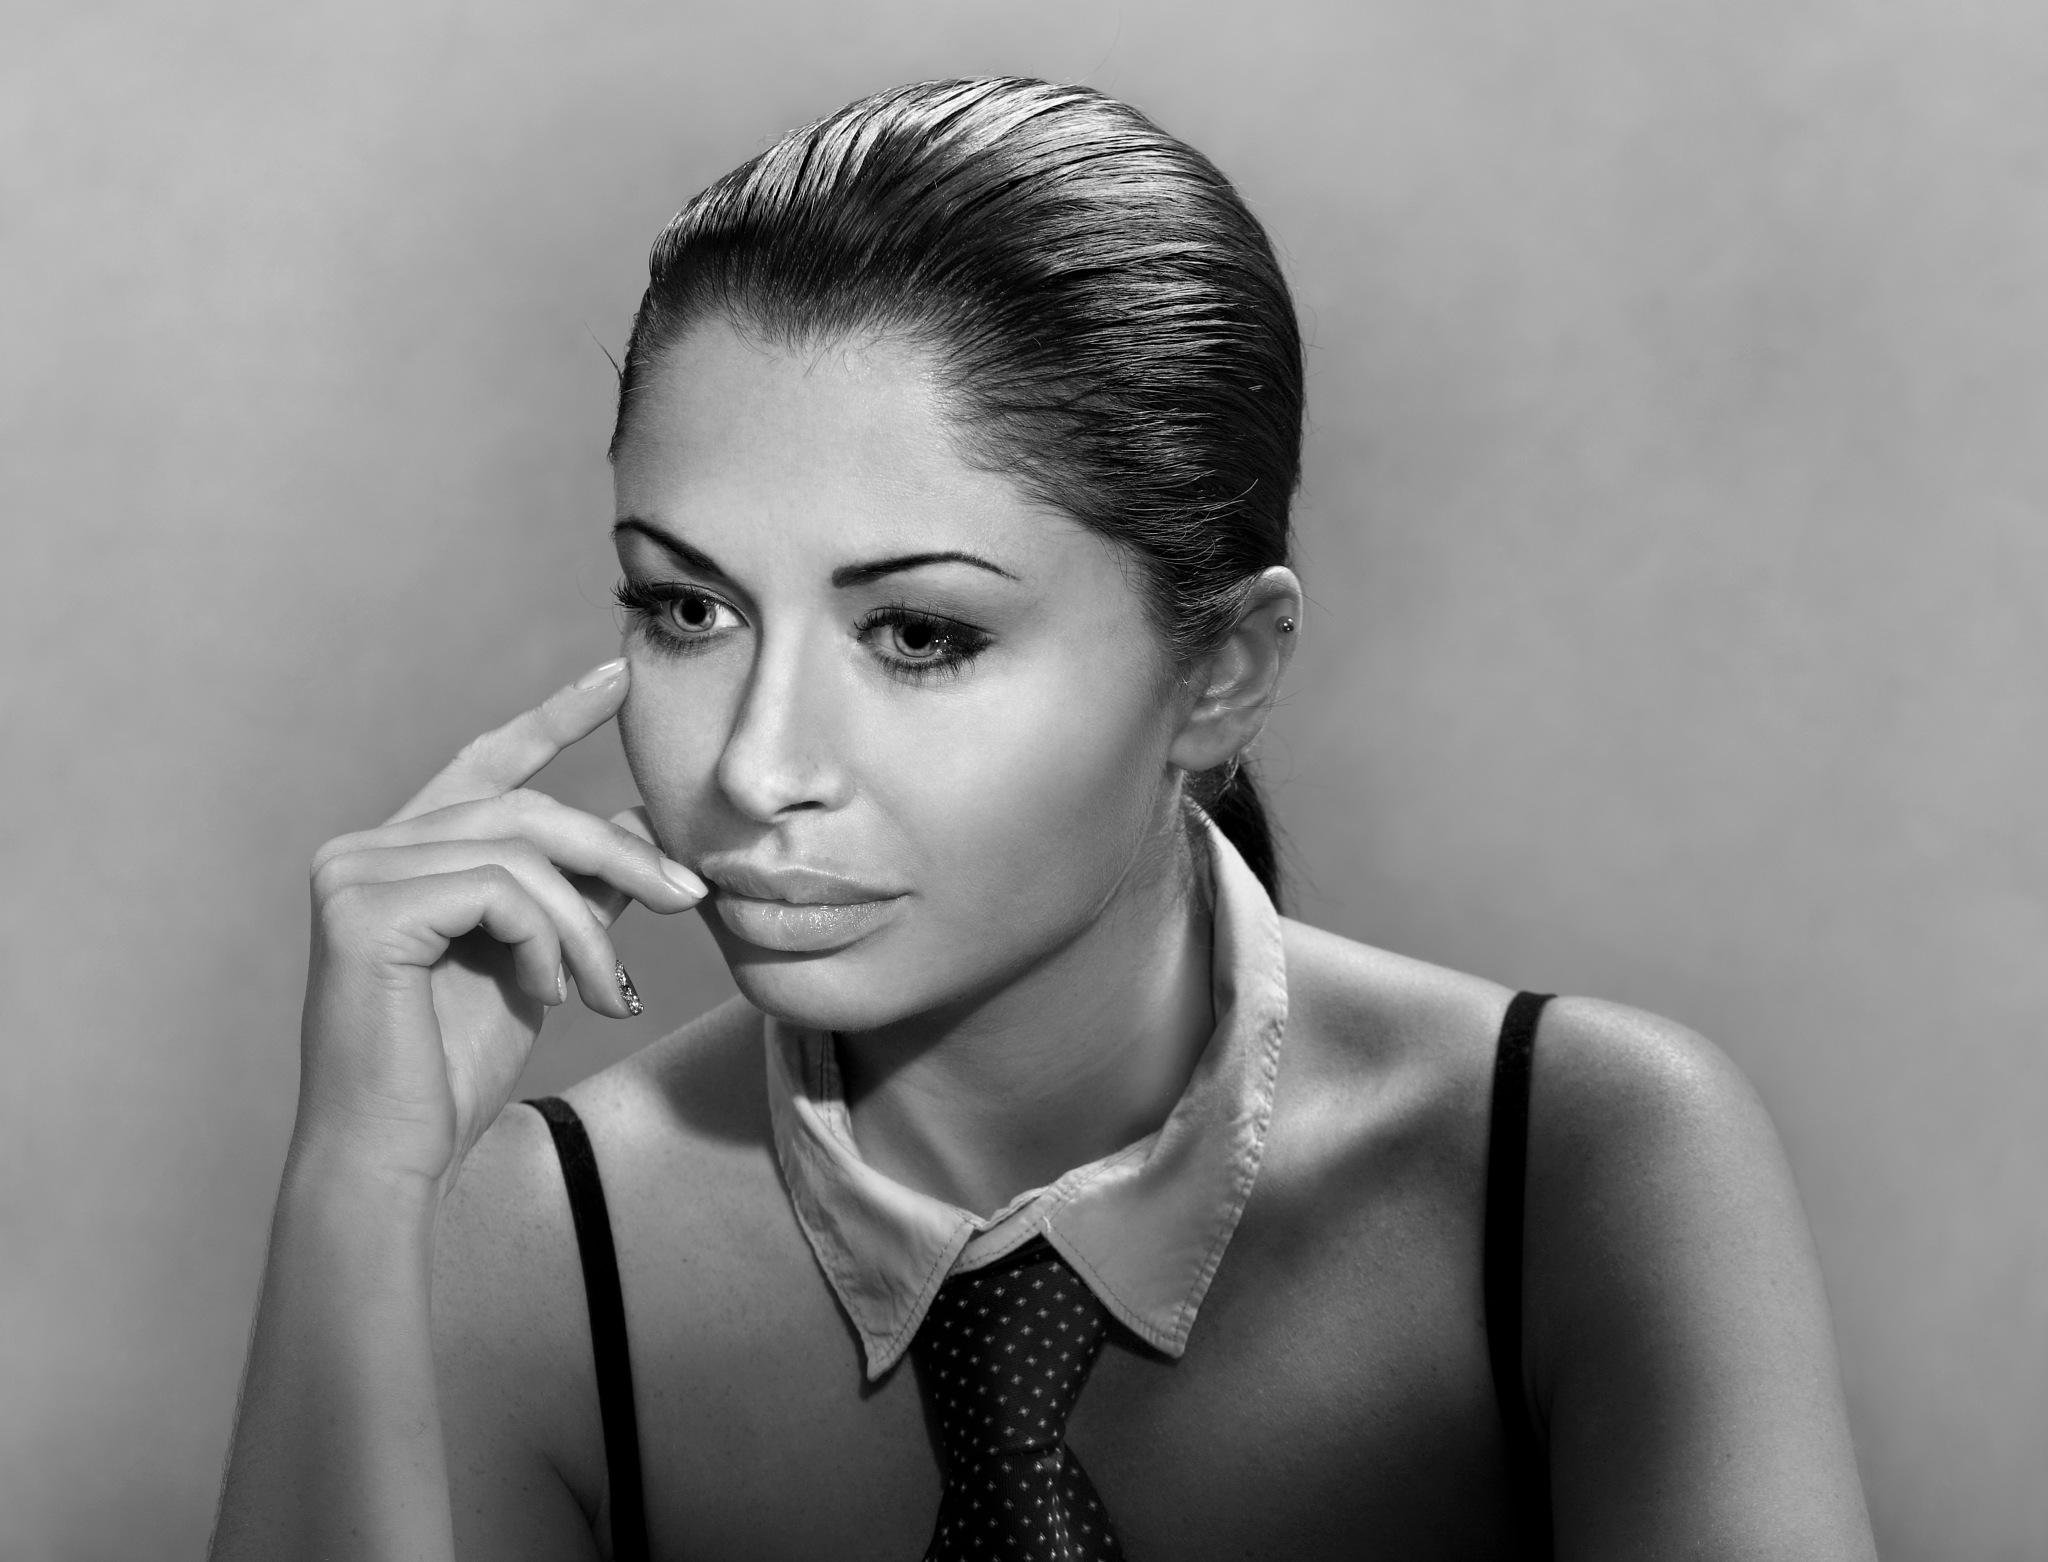 Olga by AlexandrMikheev